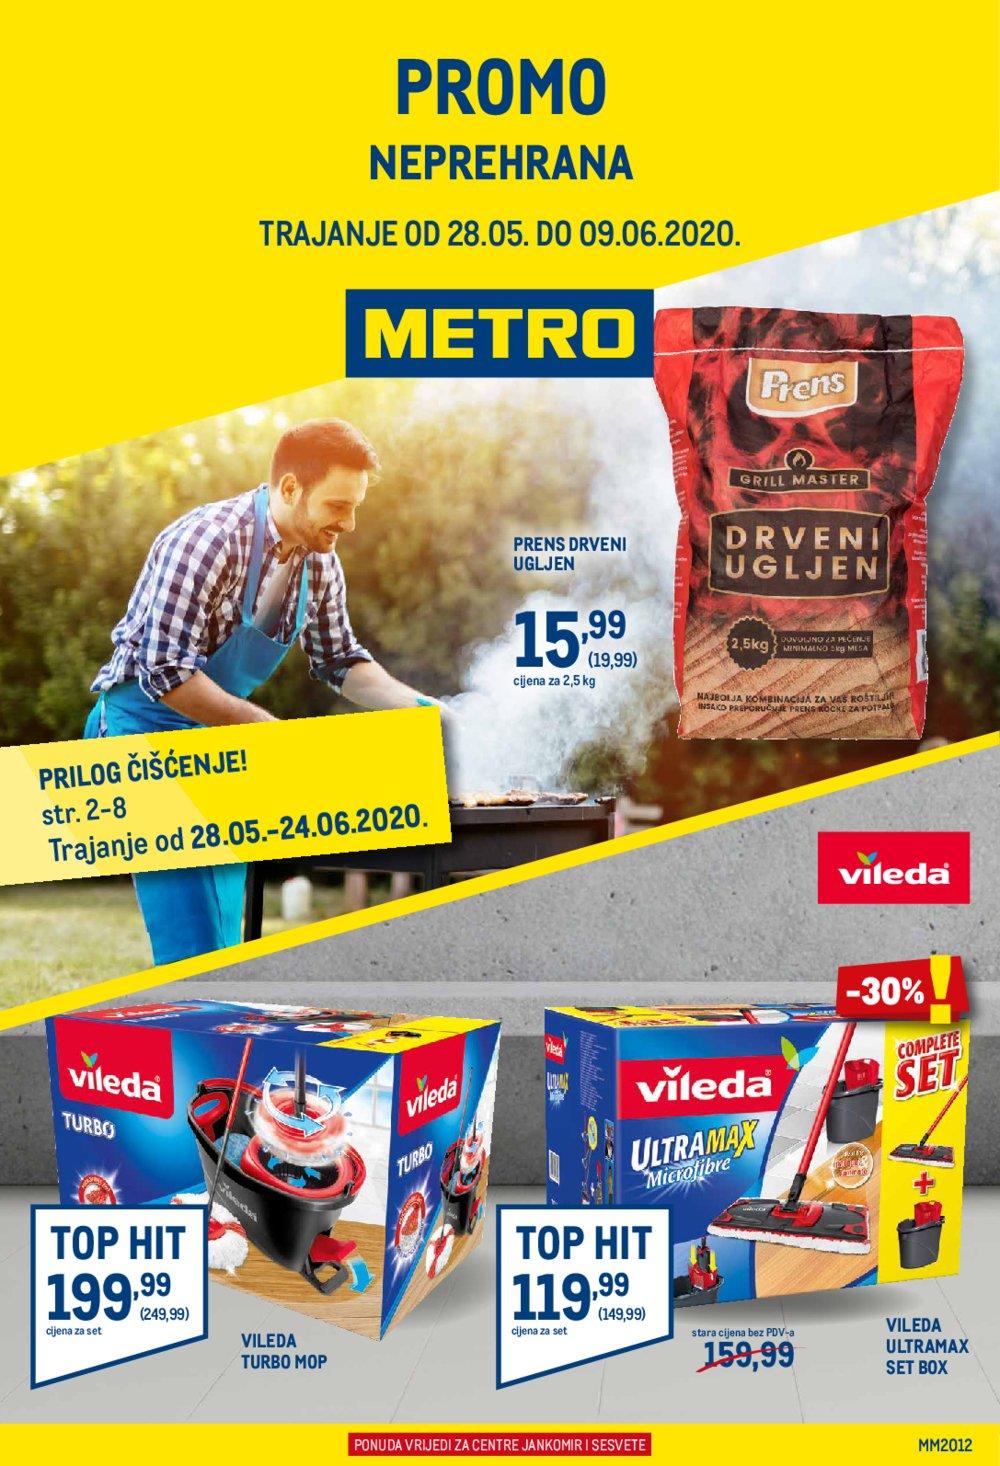 Metro katalog Neprehrana 28.05.-09.06.2020. Jankomir i Sesvete